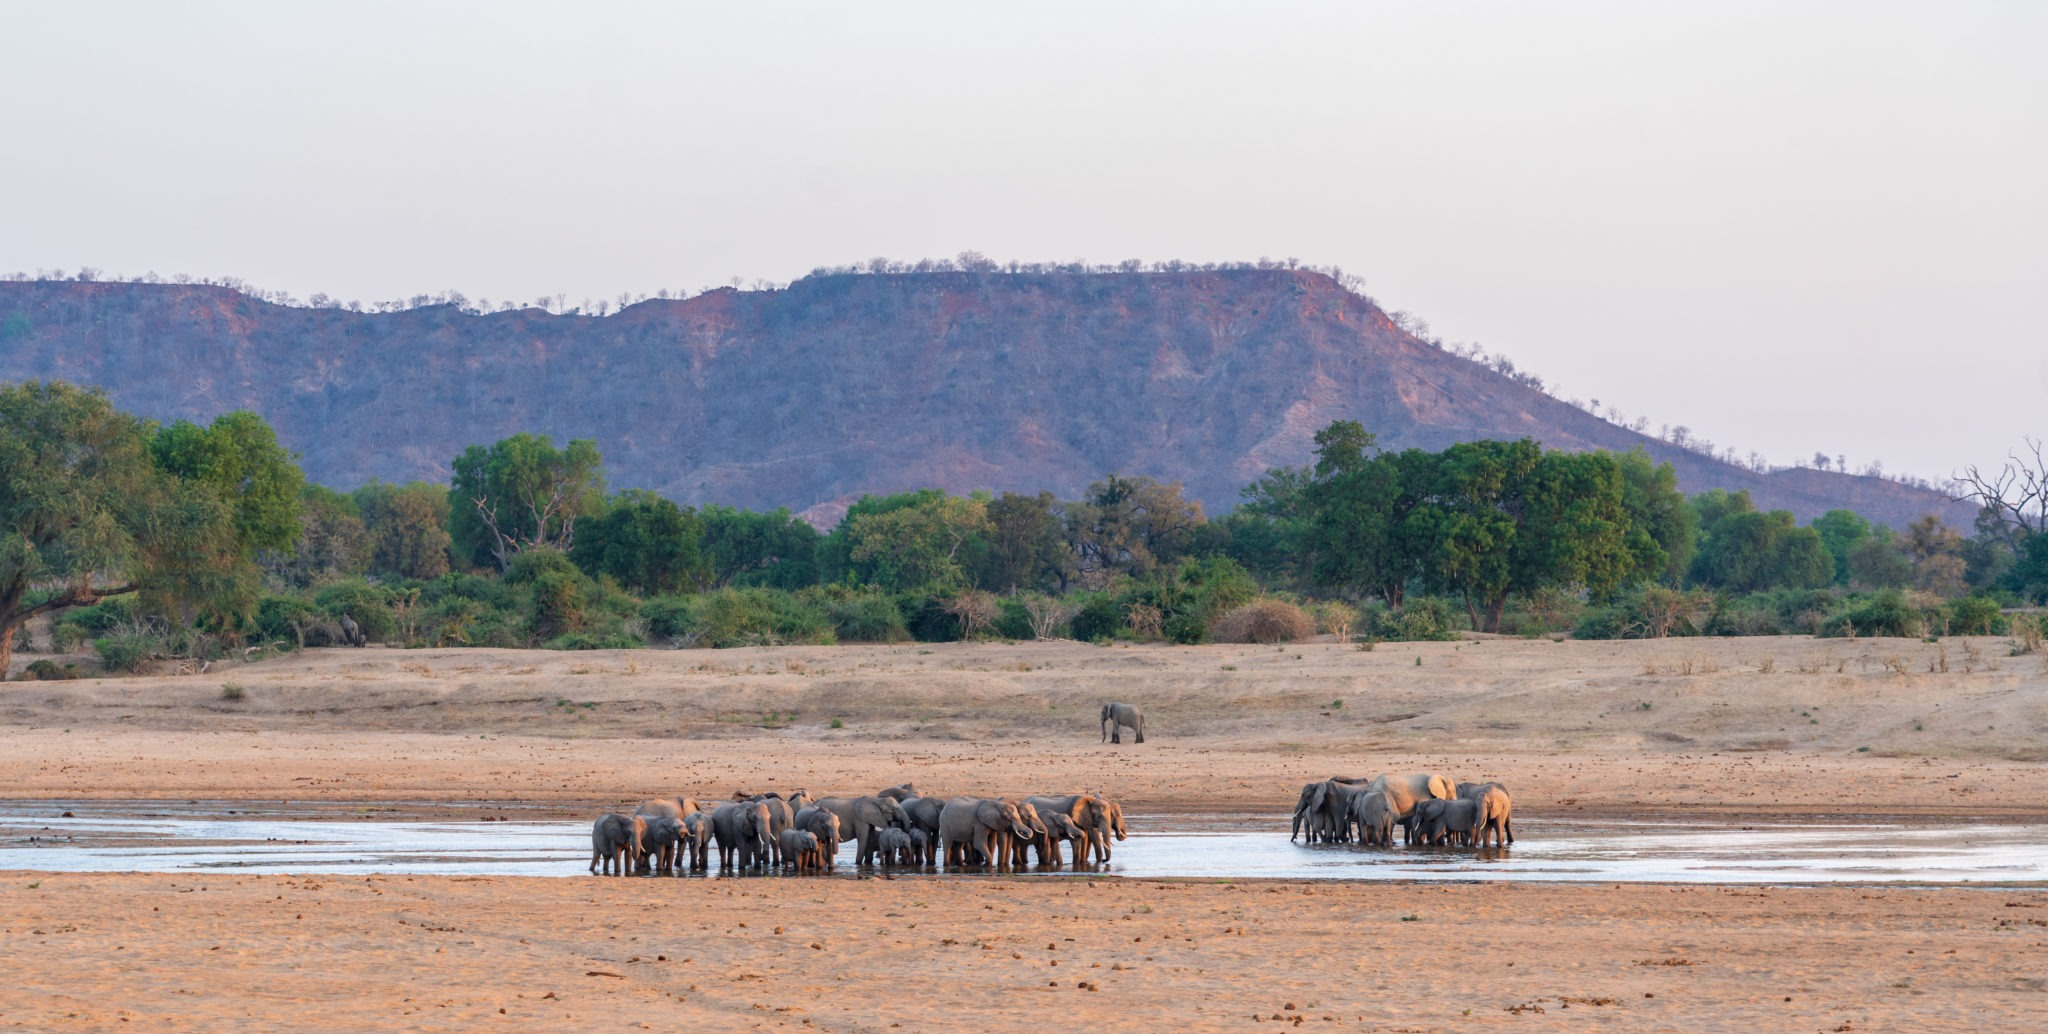 elephants frank steenhuisen private guide zimbabwe gonarezhou